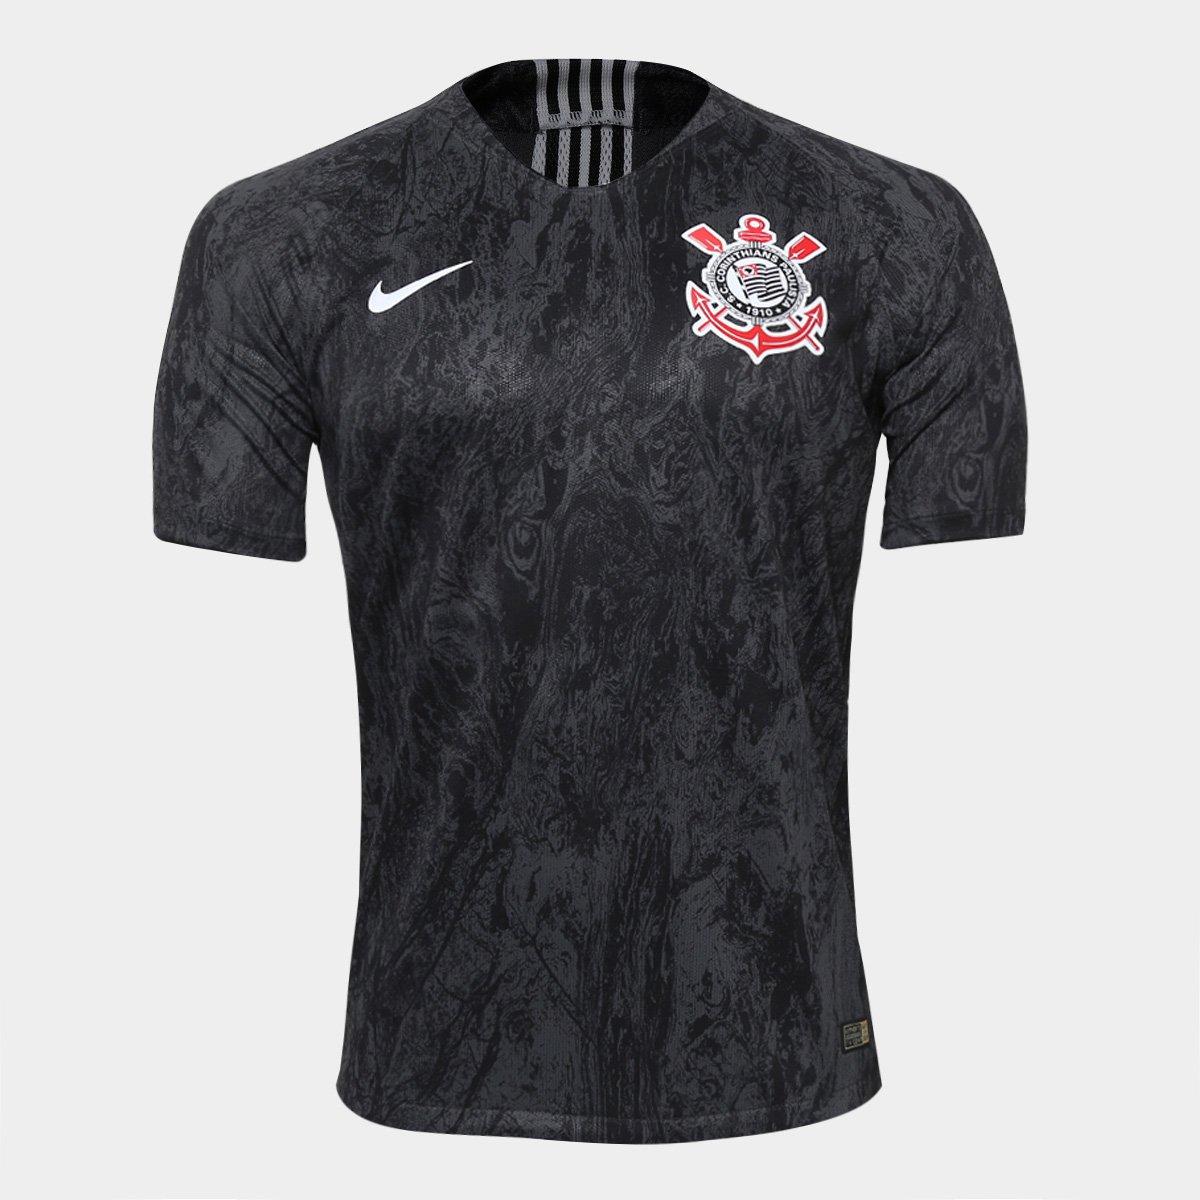 Camisa Corinthians II 2018 - Jogador Nike Masculina - Preto - Compre ... 0910b97891520